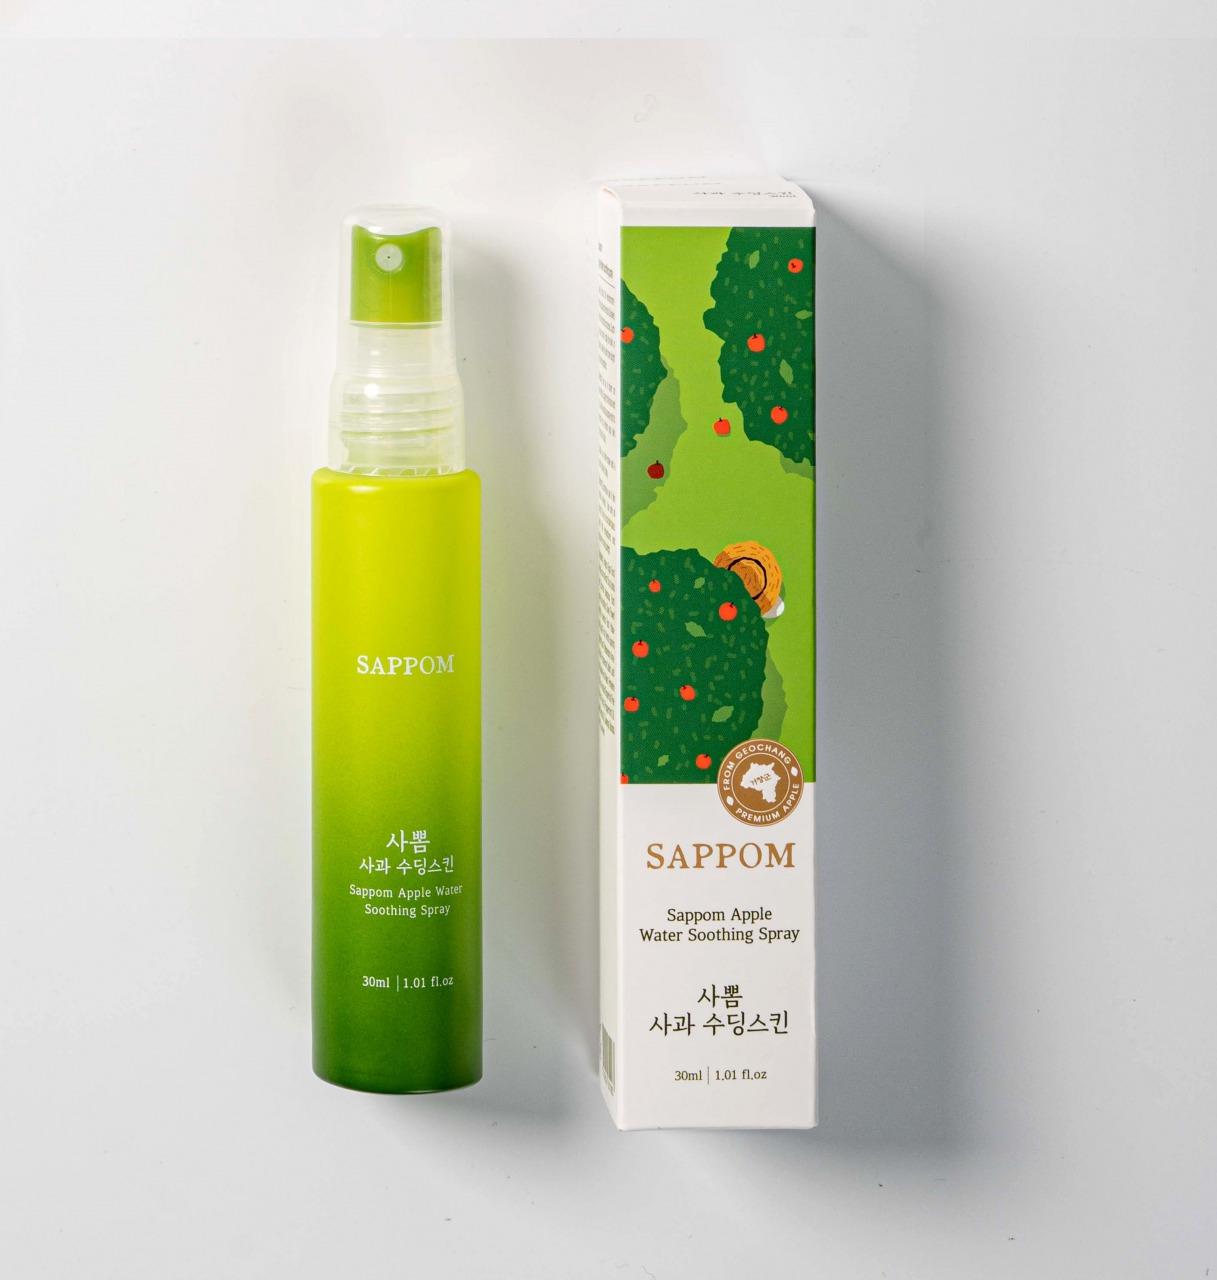 SAPPOM 安らぎ蒸留化粧水 30ml 1本 ポータブルサイズ単品商品